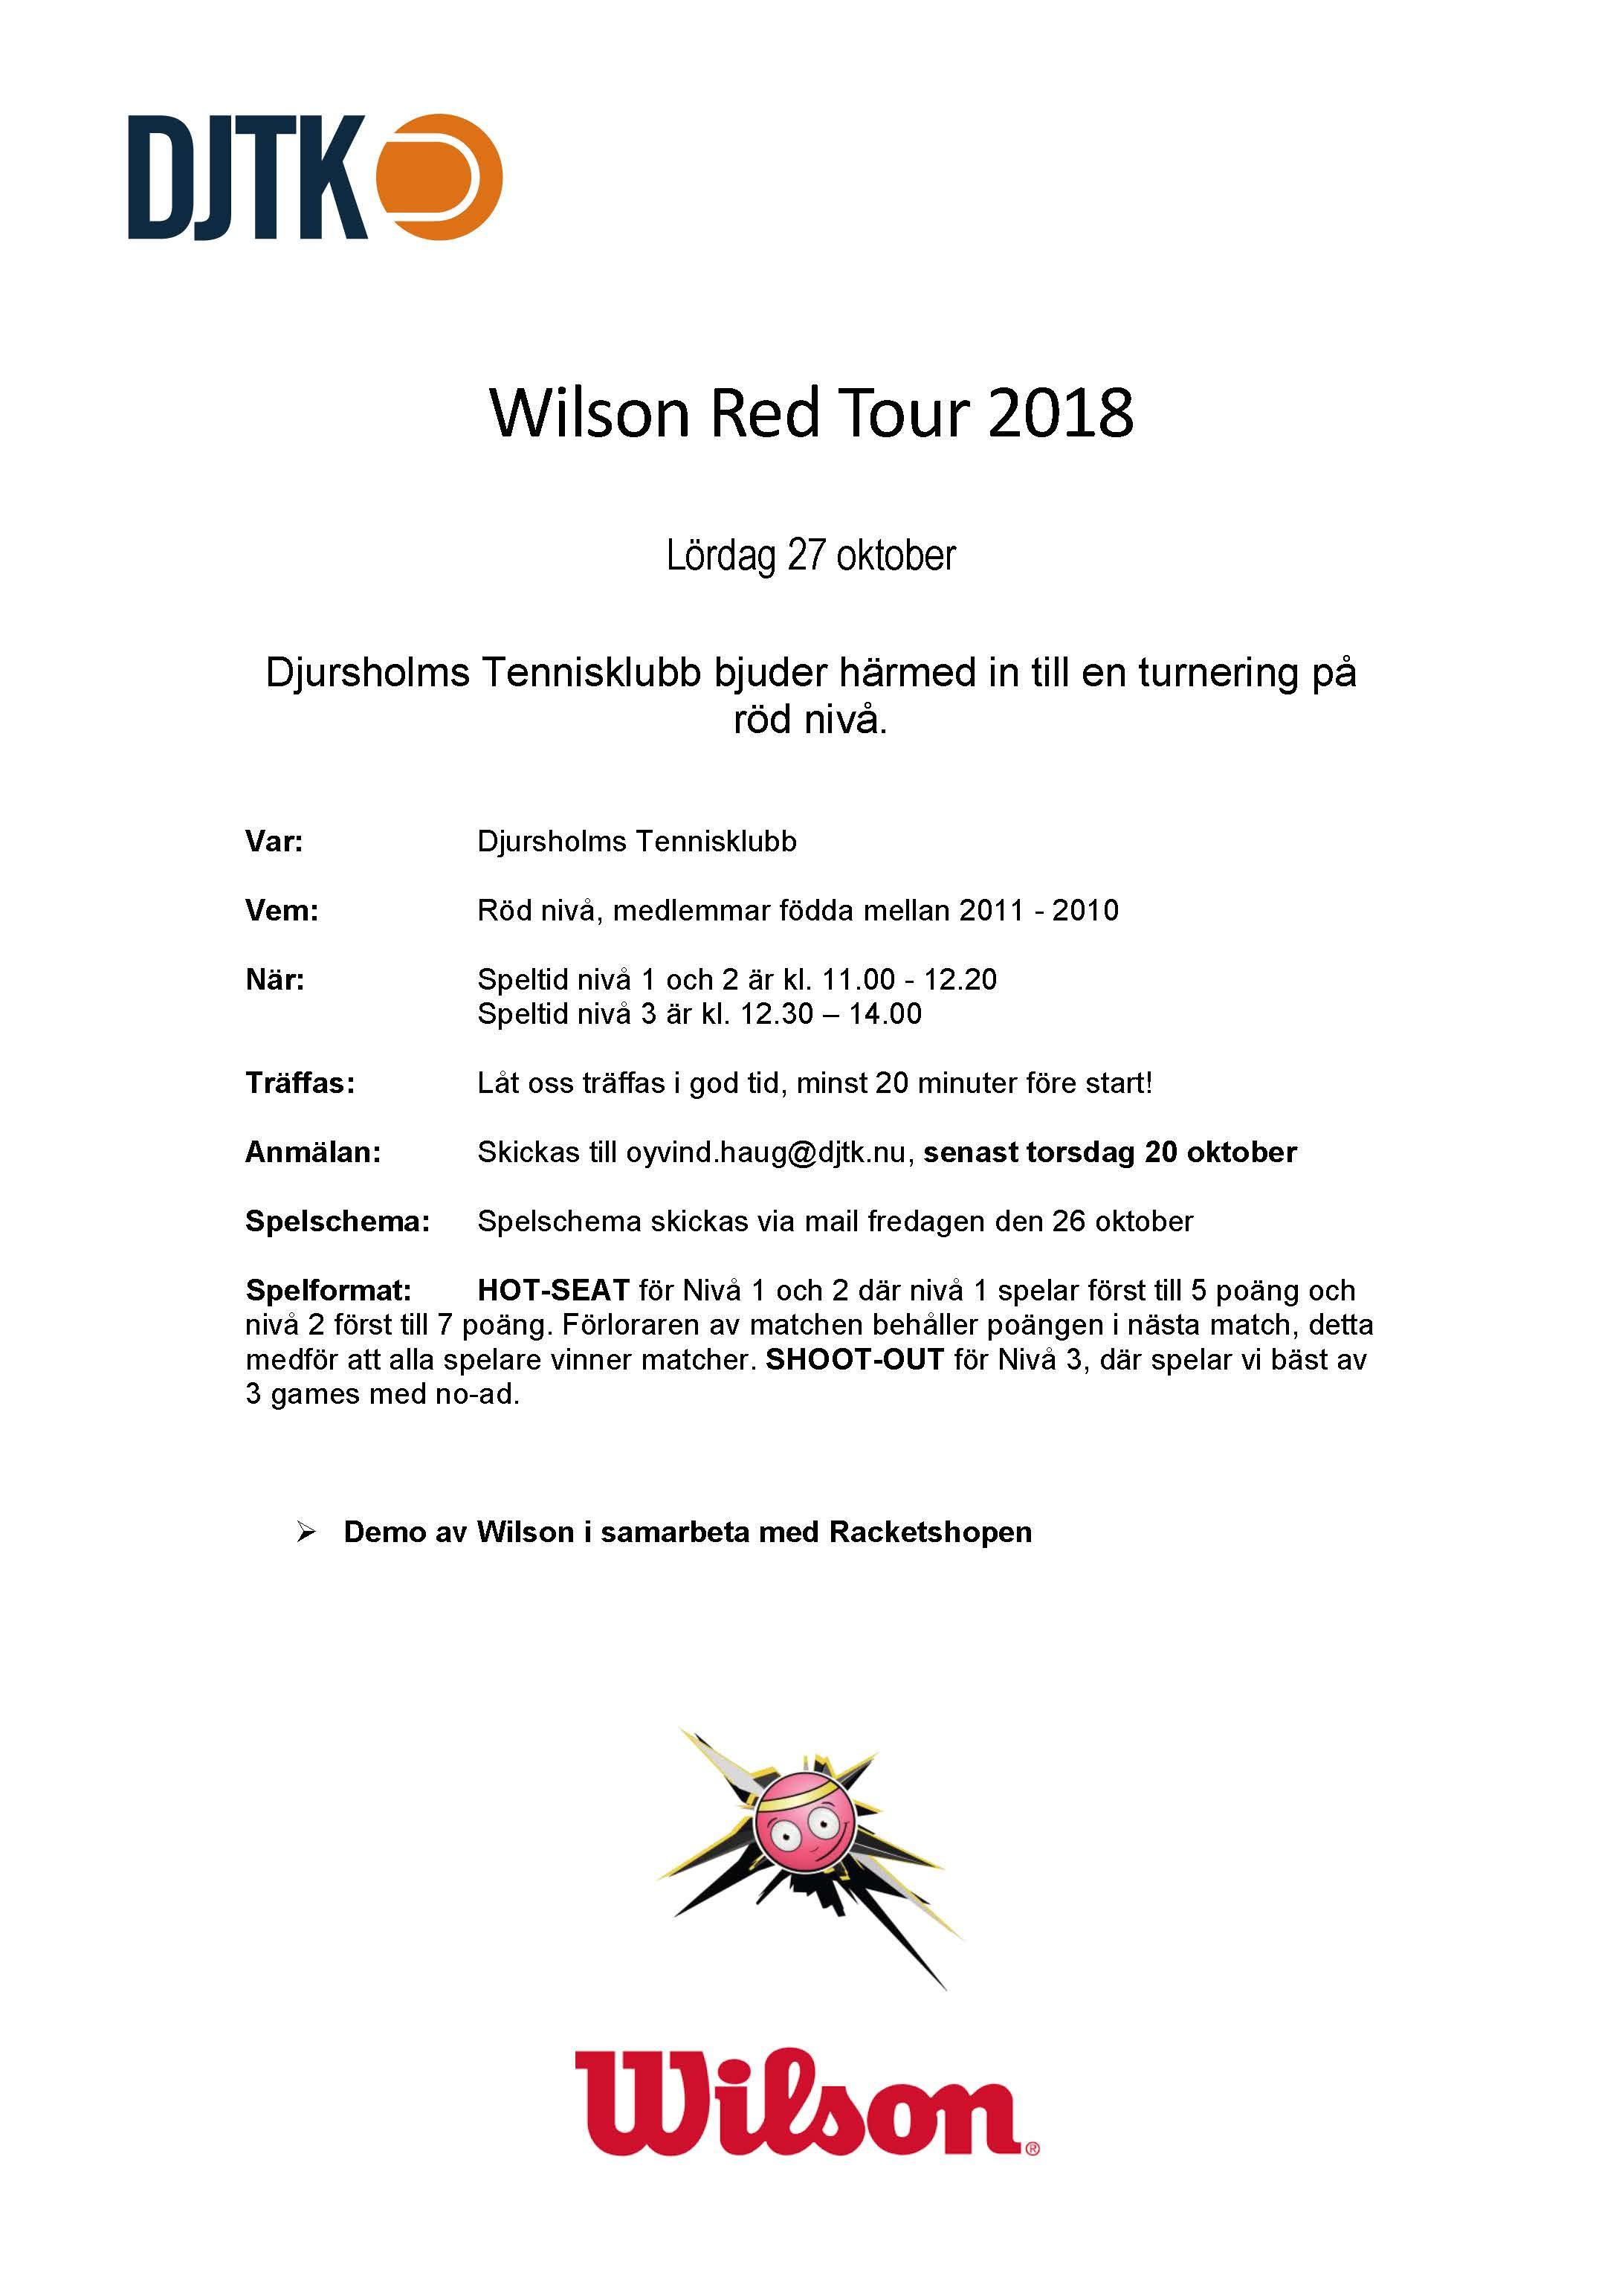 Wilson Redtour 27 oktober 2018